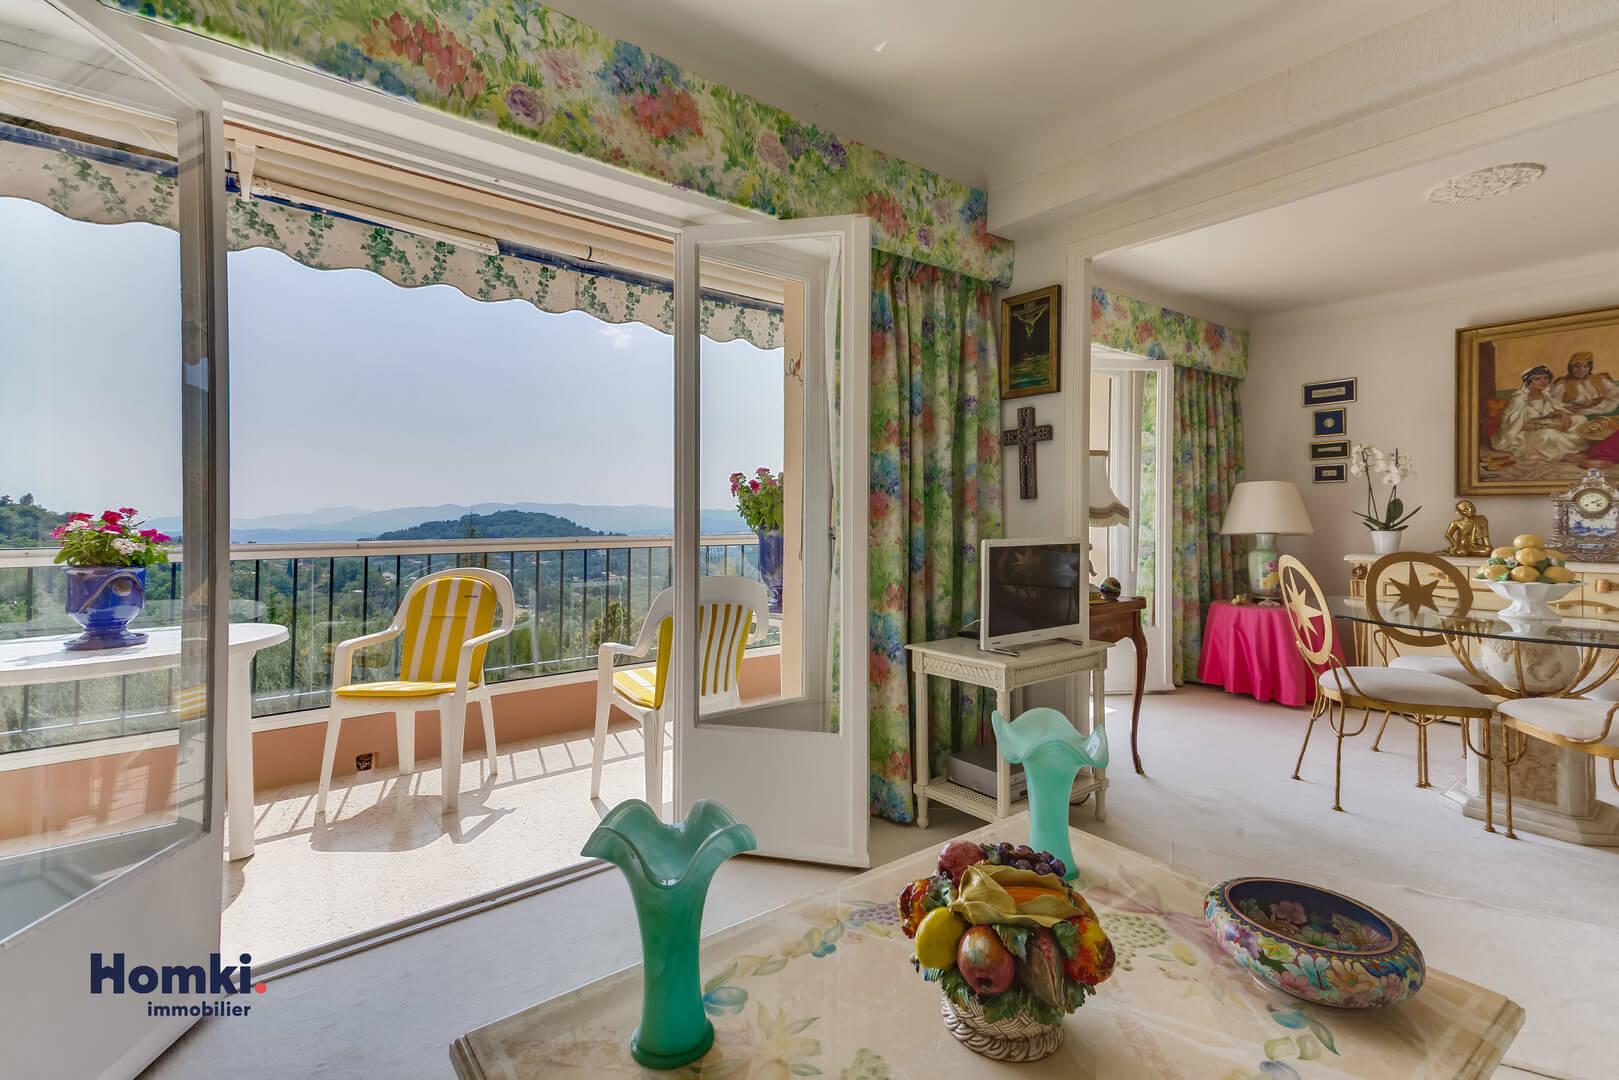 Vente appartement Grasse T3 06520 French Riviera_2